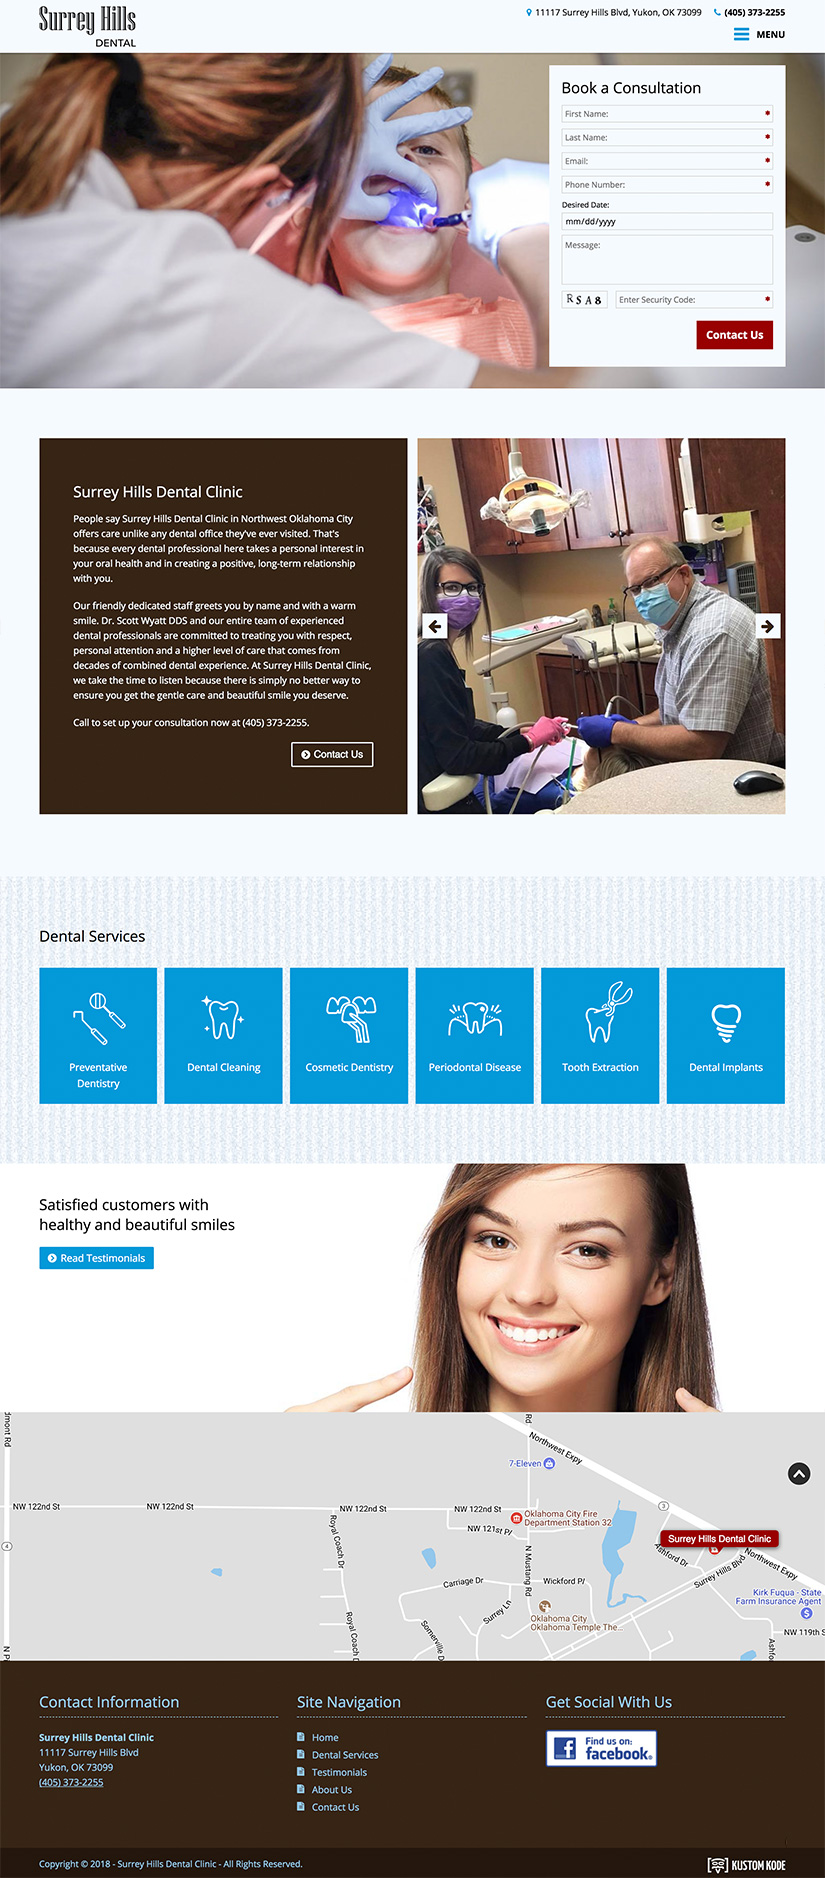 Web Design for a Dental Clinic